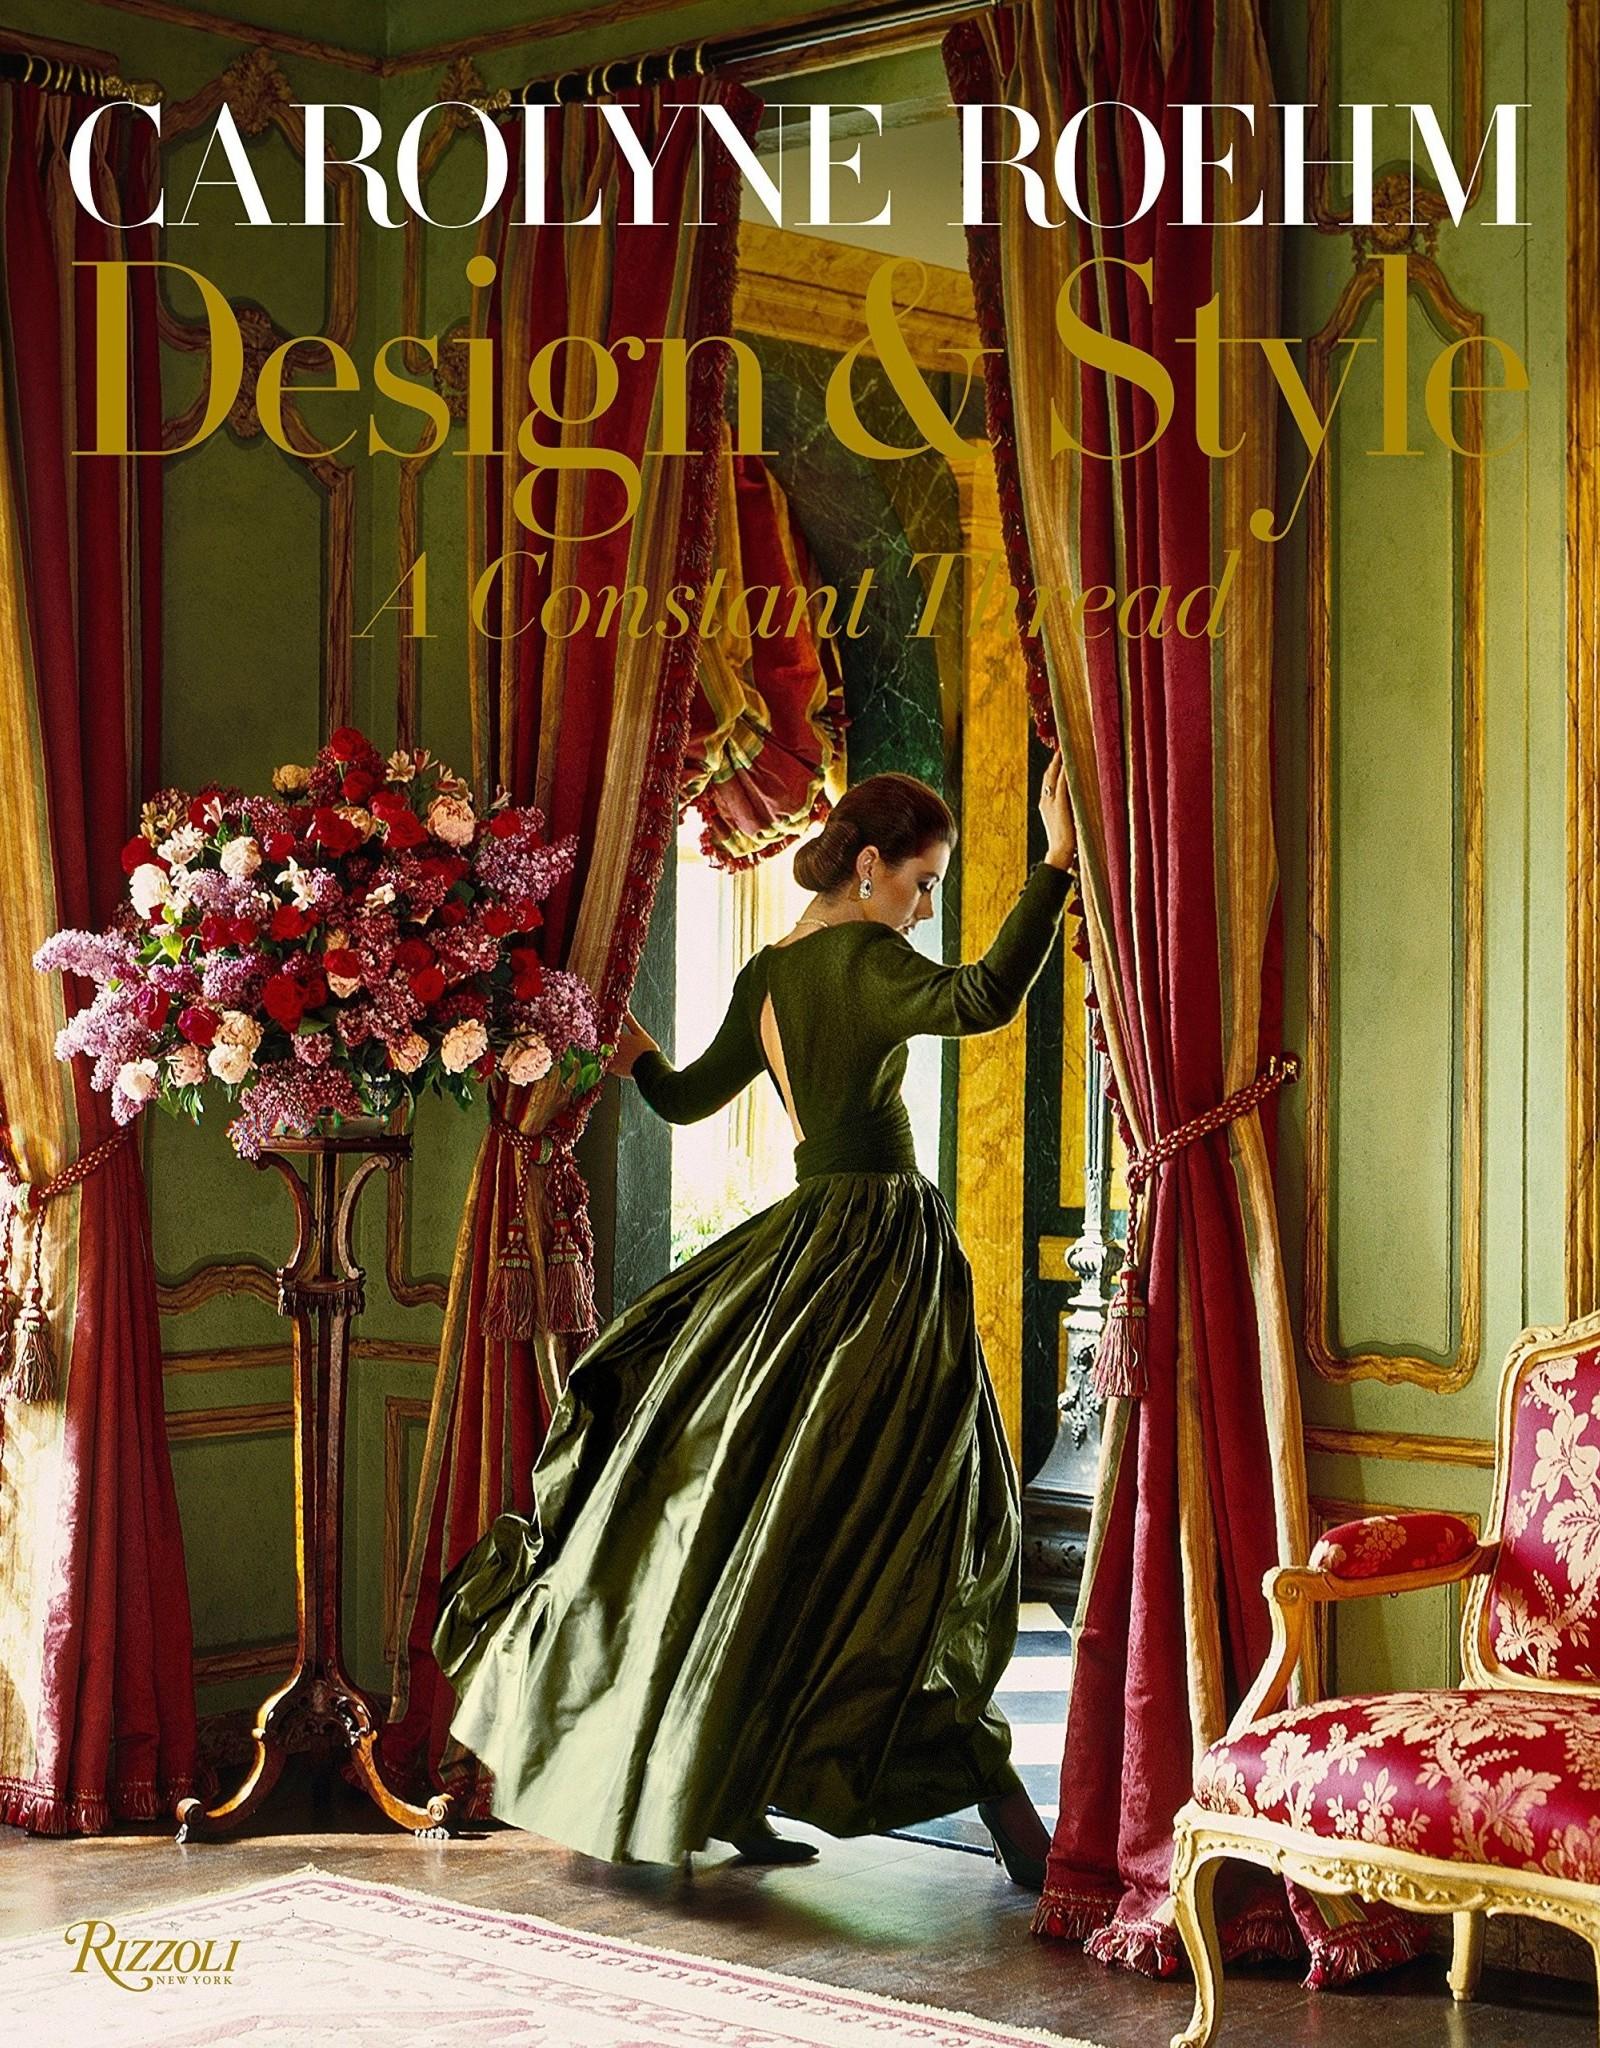 Home Carolyne Roehm Style & Design